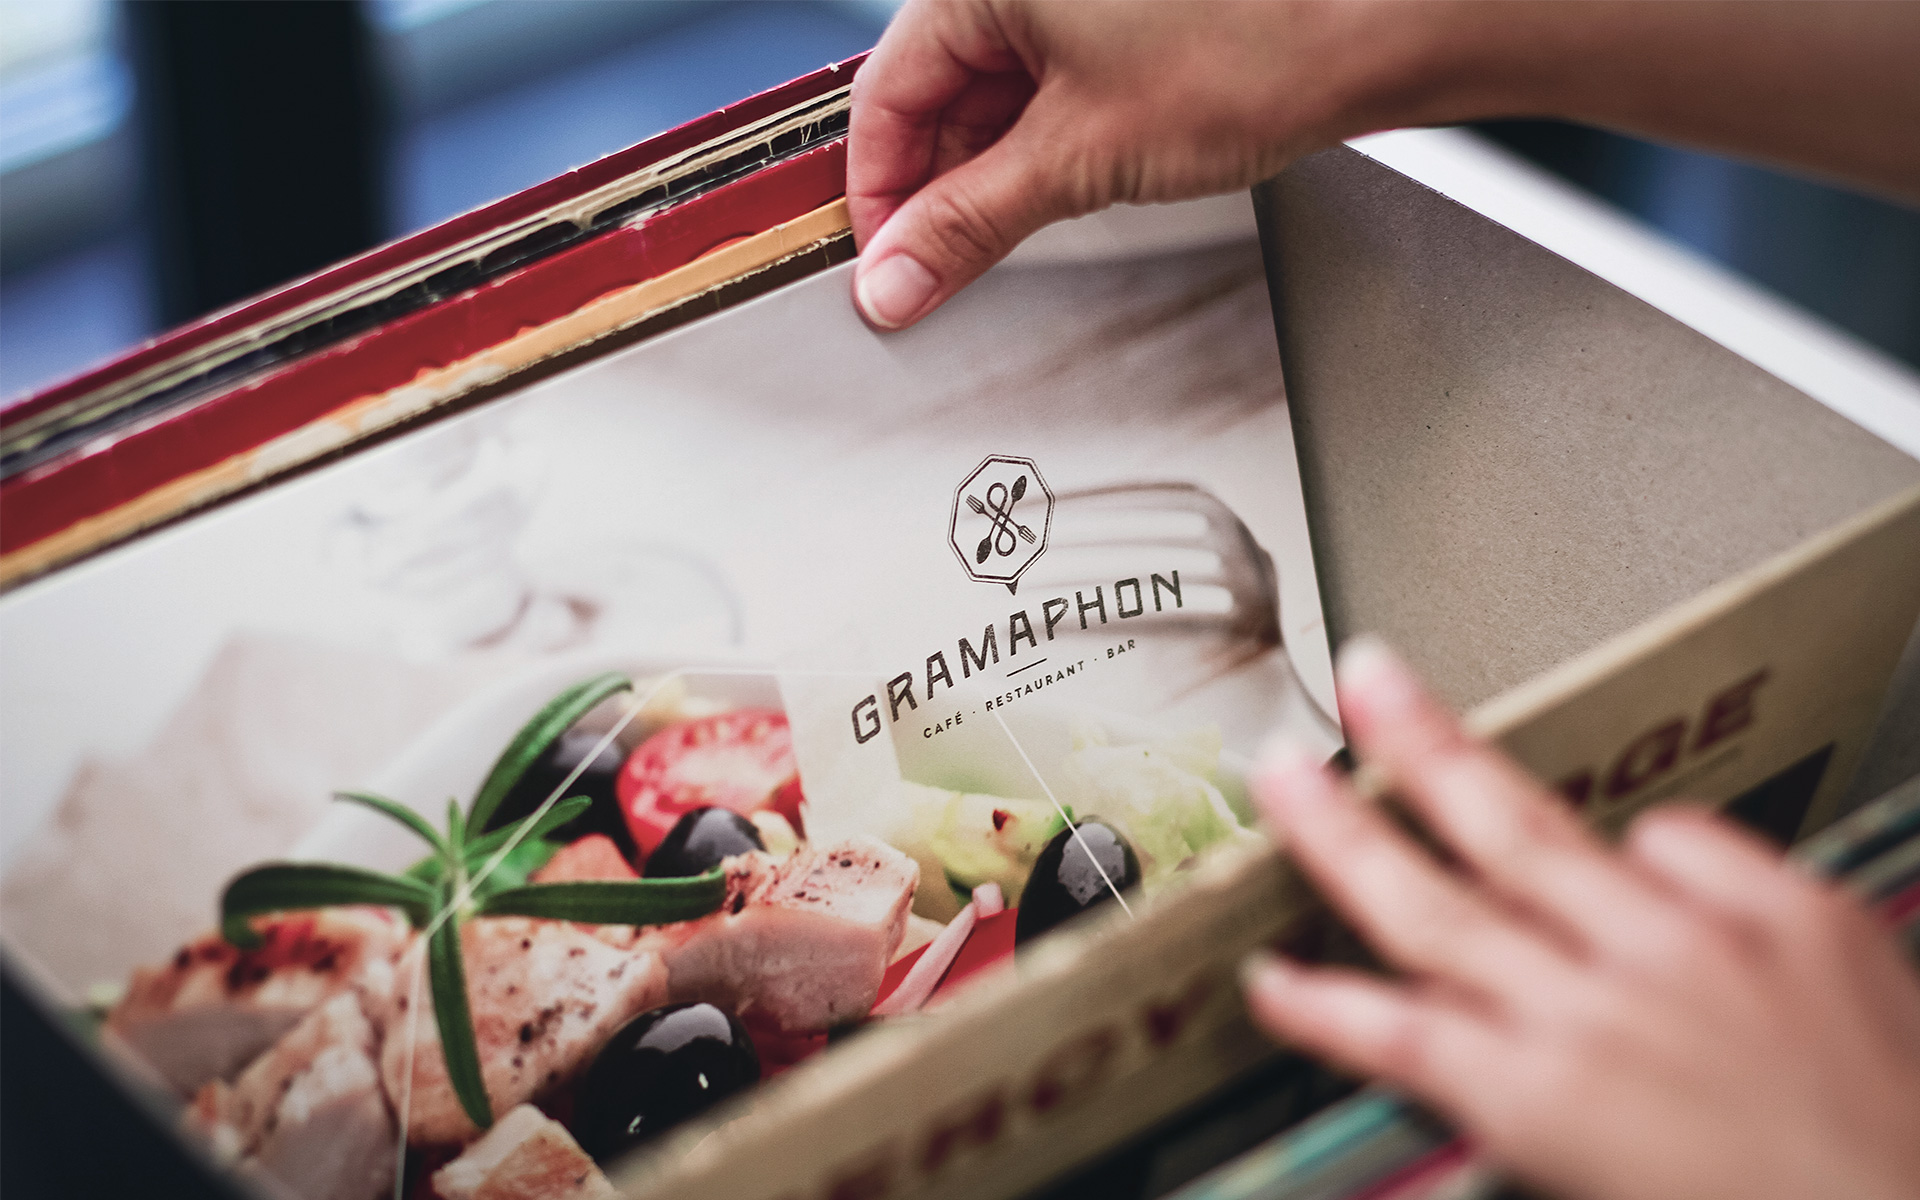 Gramaphon-1